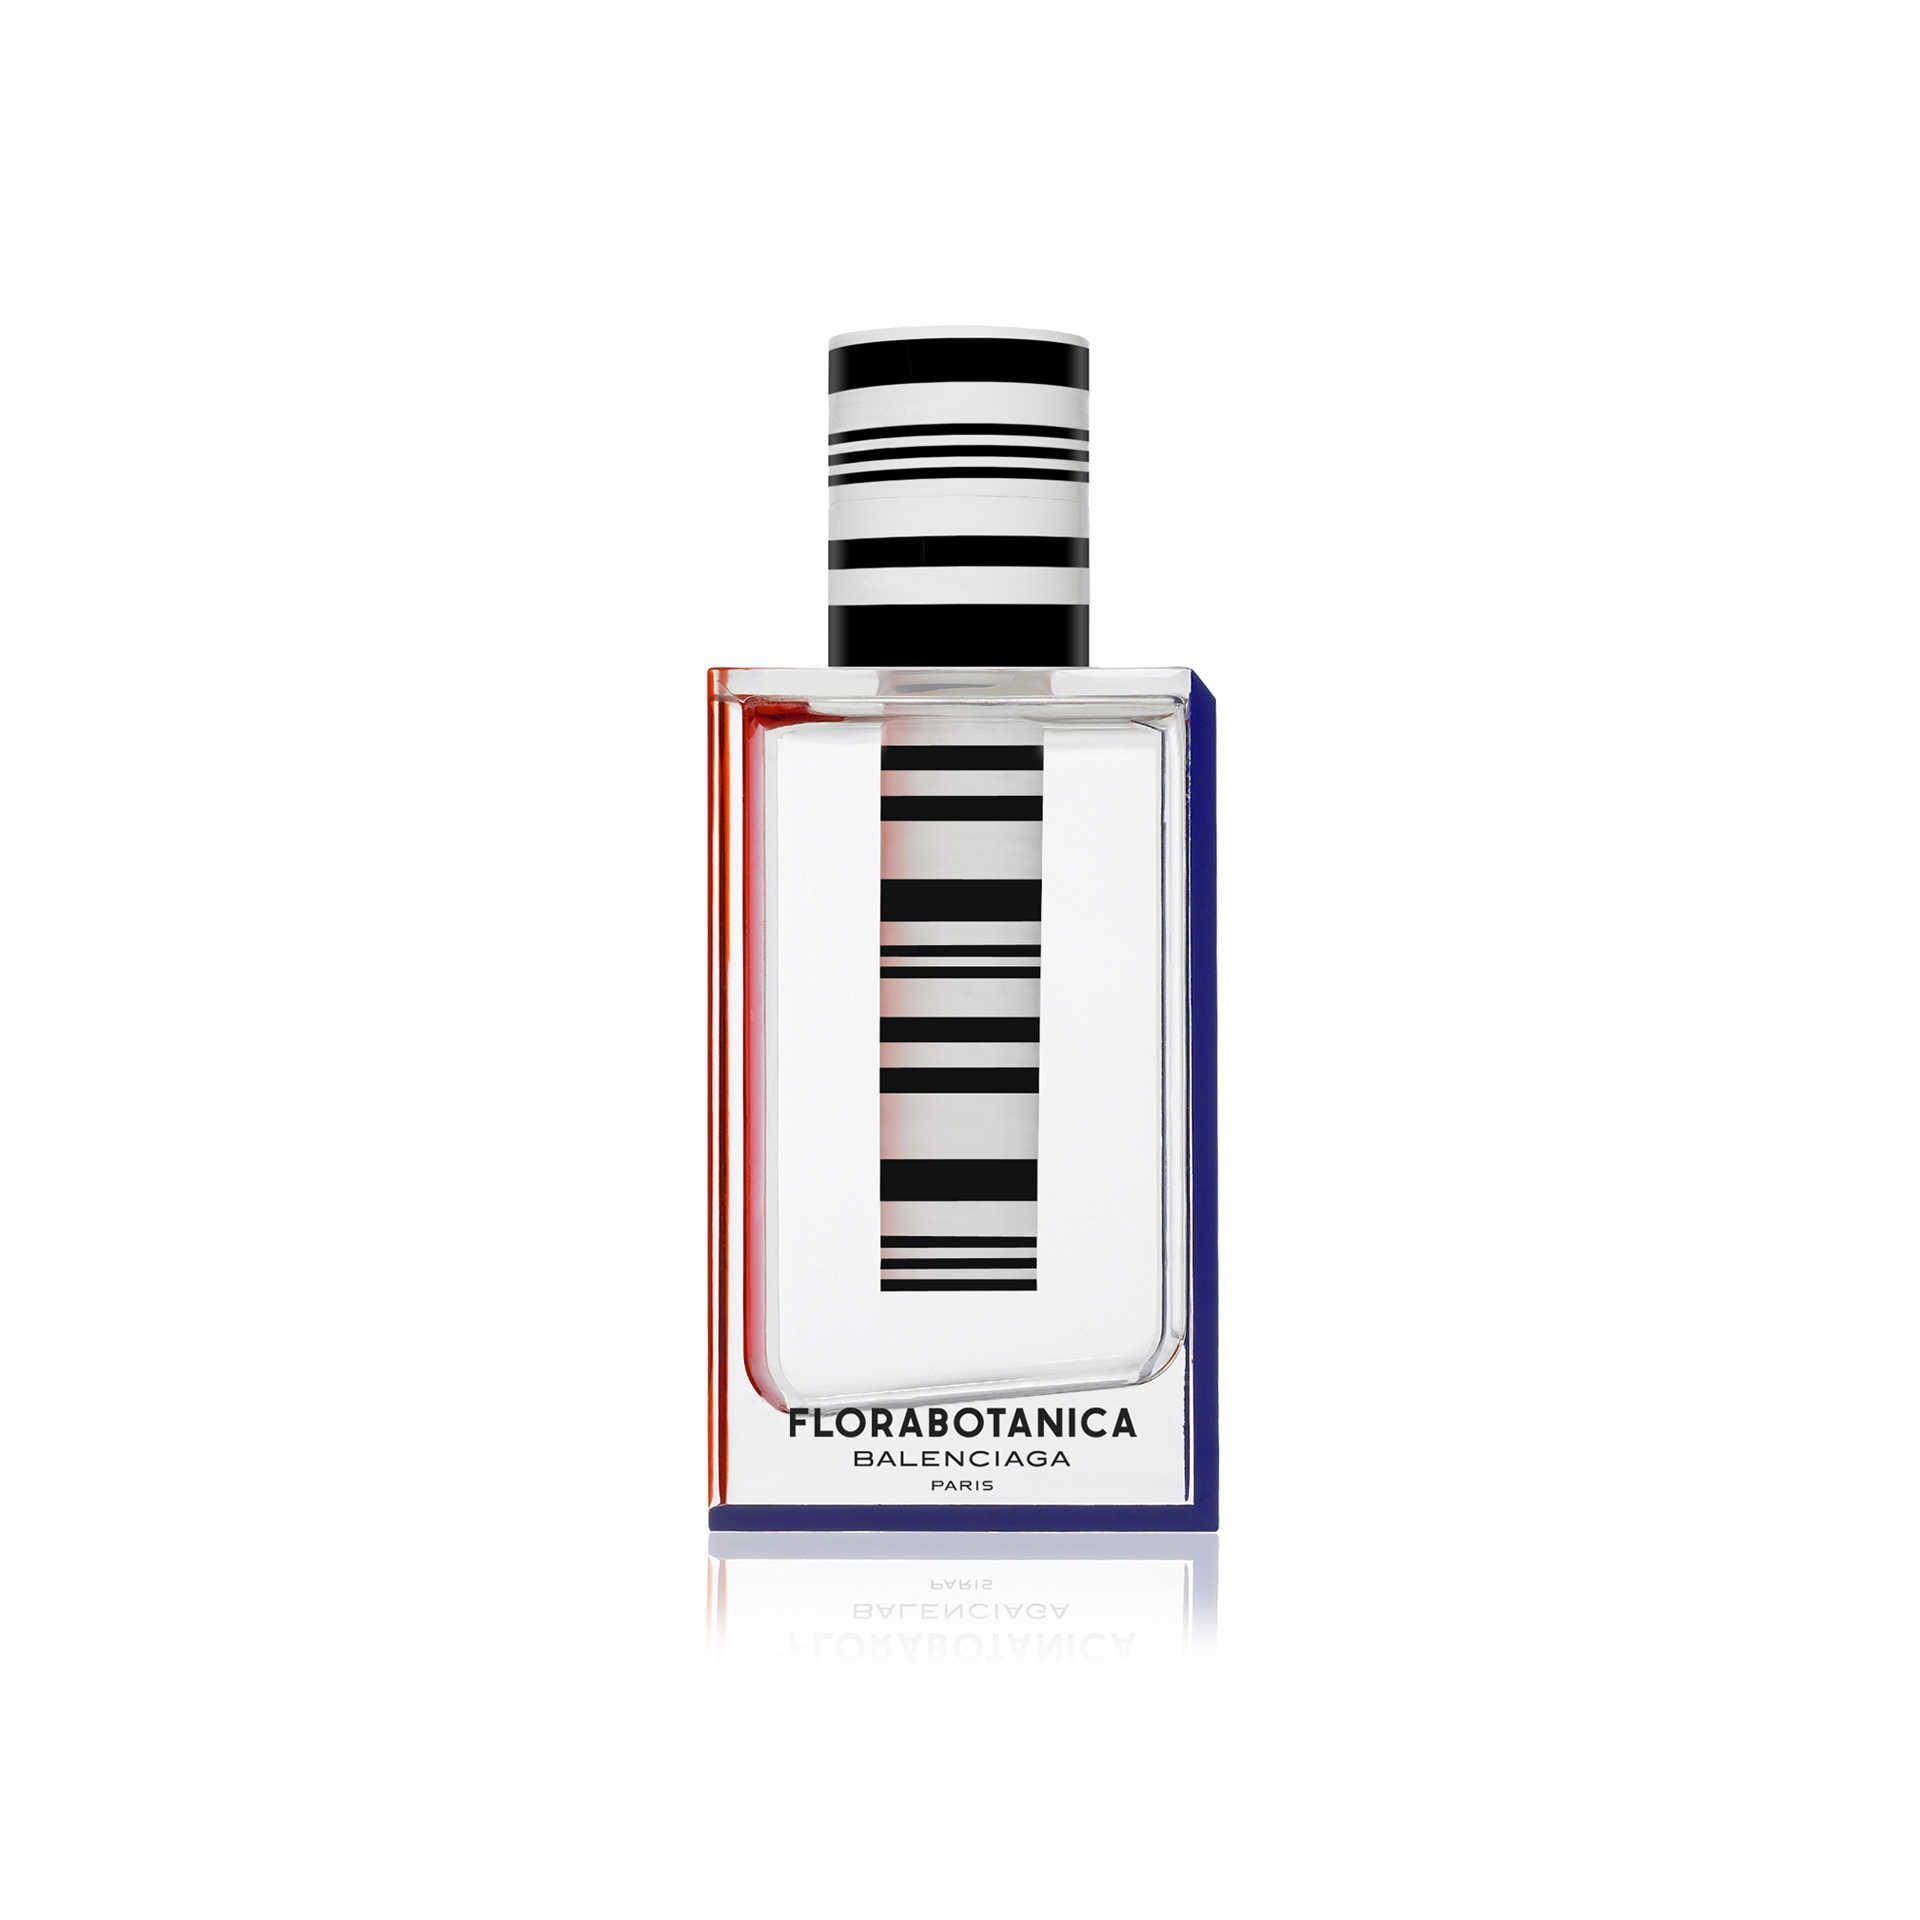 BALENCIAGA Florabotanica Eau De Parfum 100 Ml Parfum D f